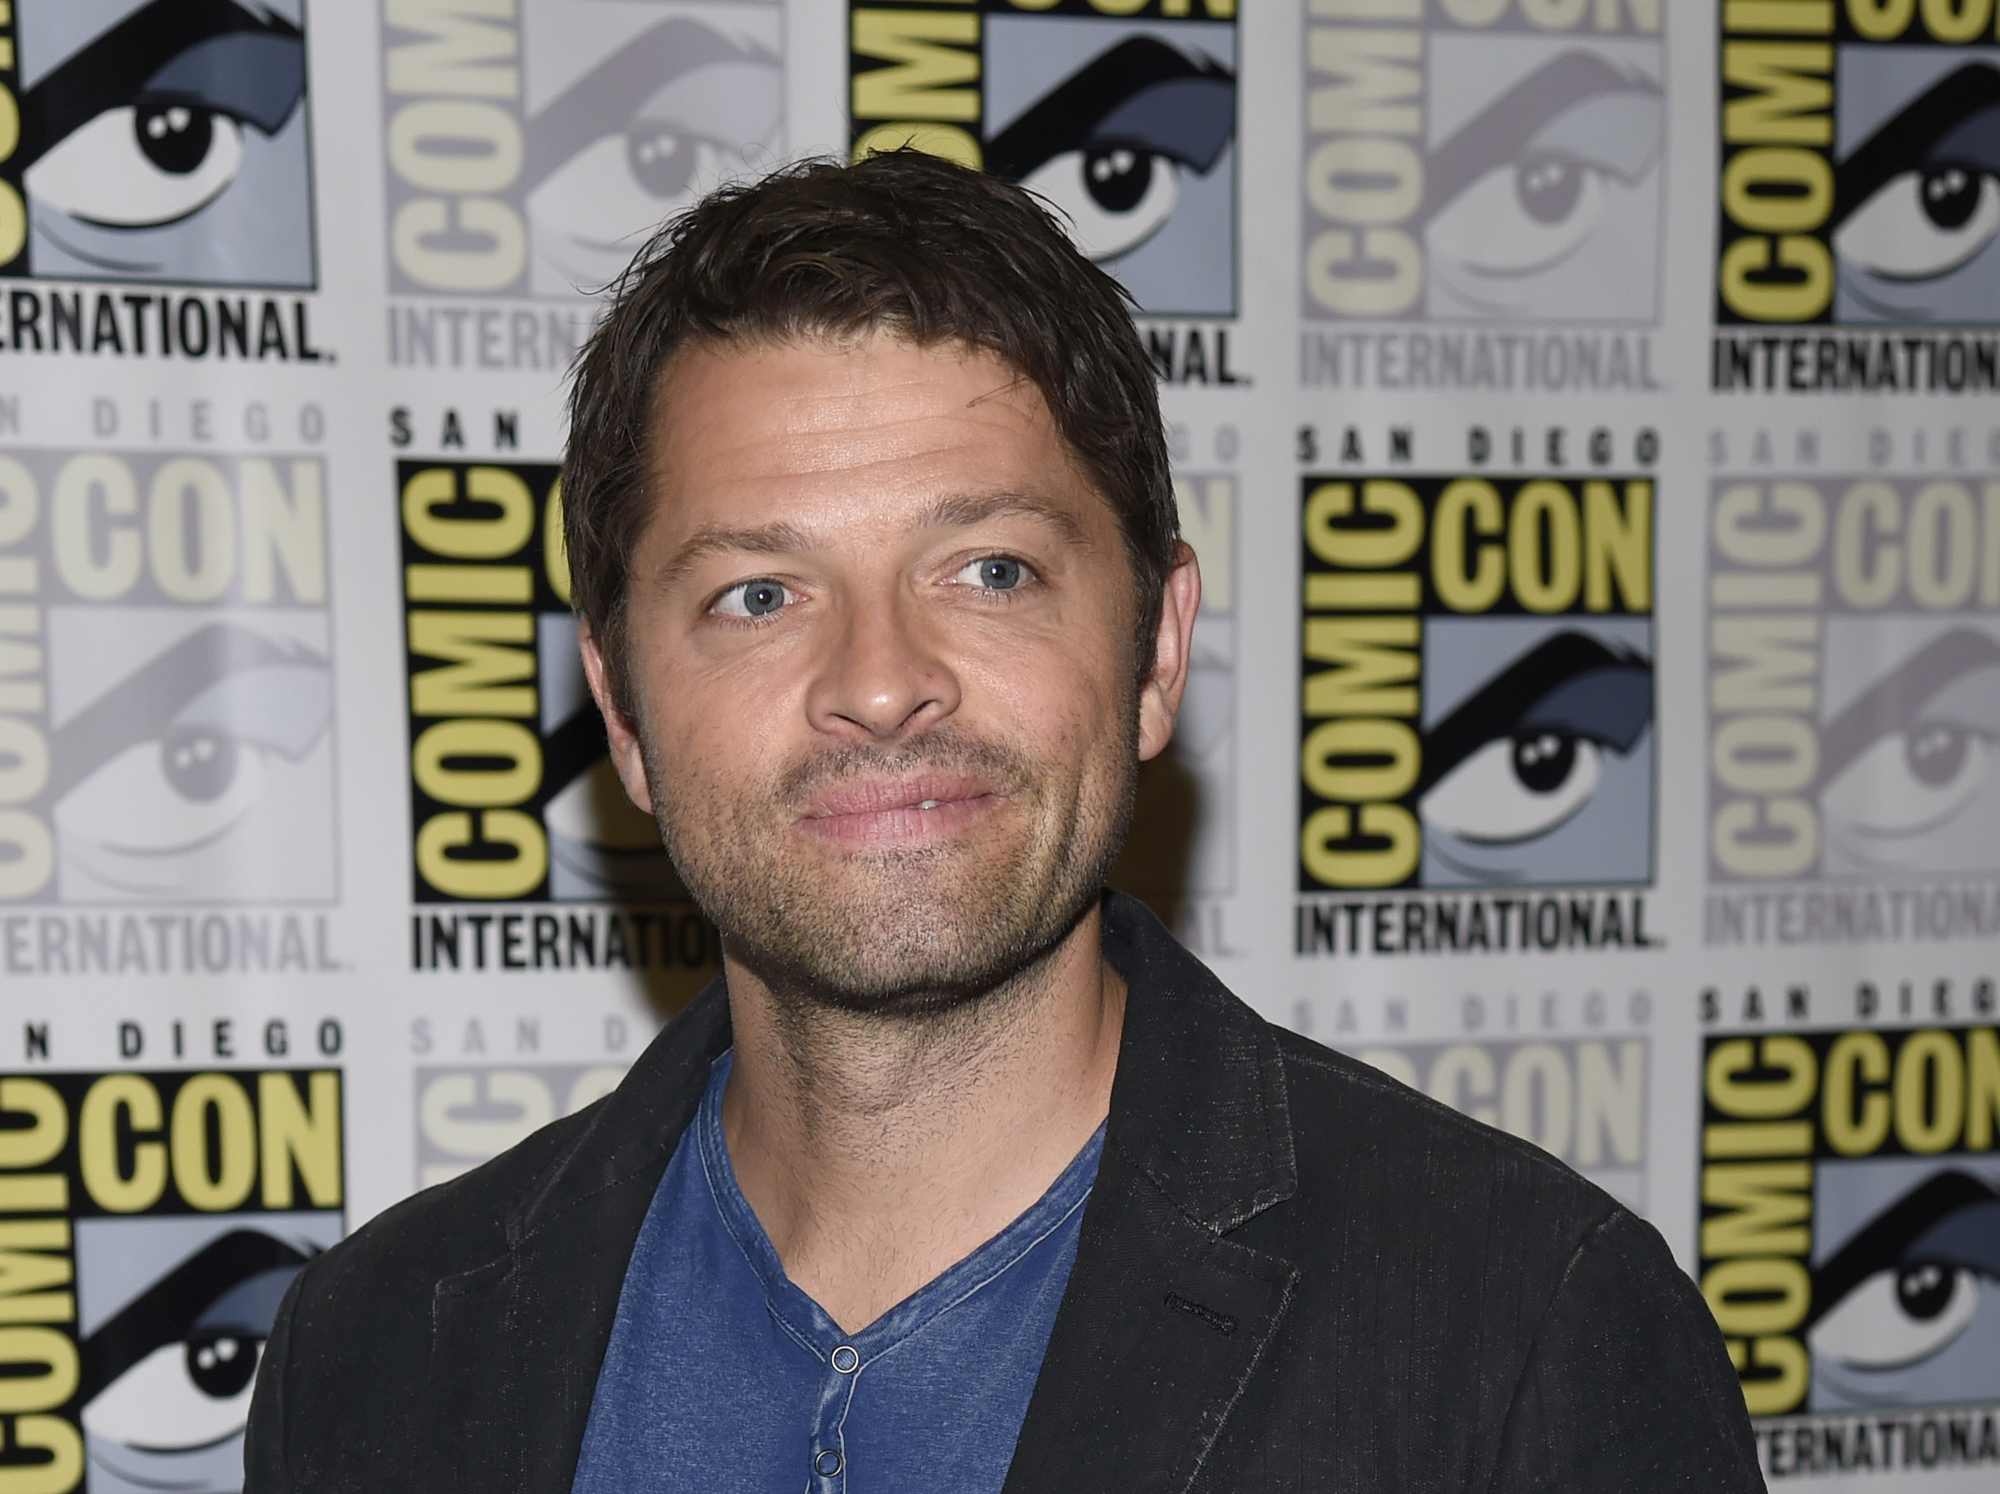 Misha Collins Actor Smile Full HD 2K Wallpaper